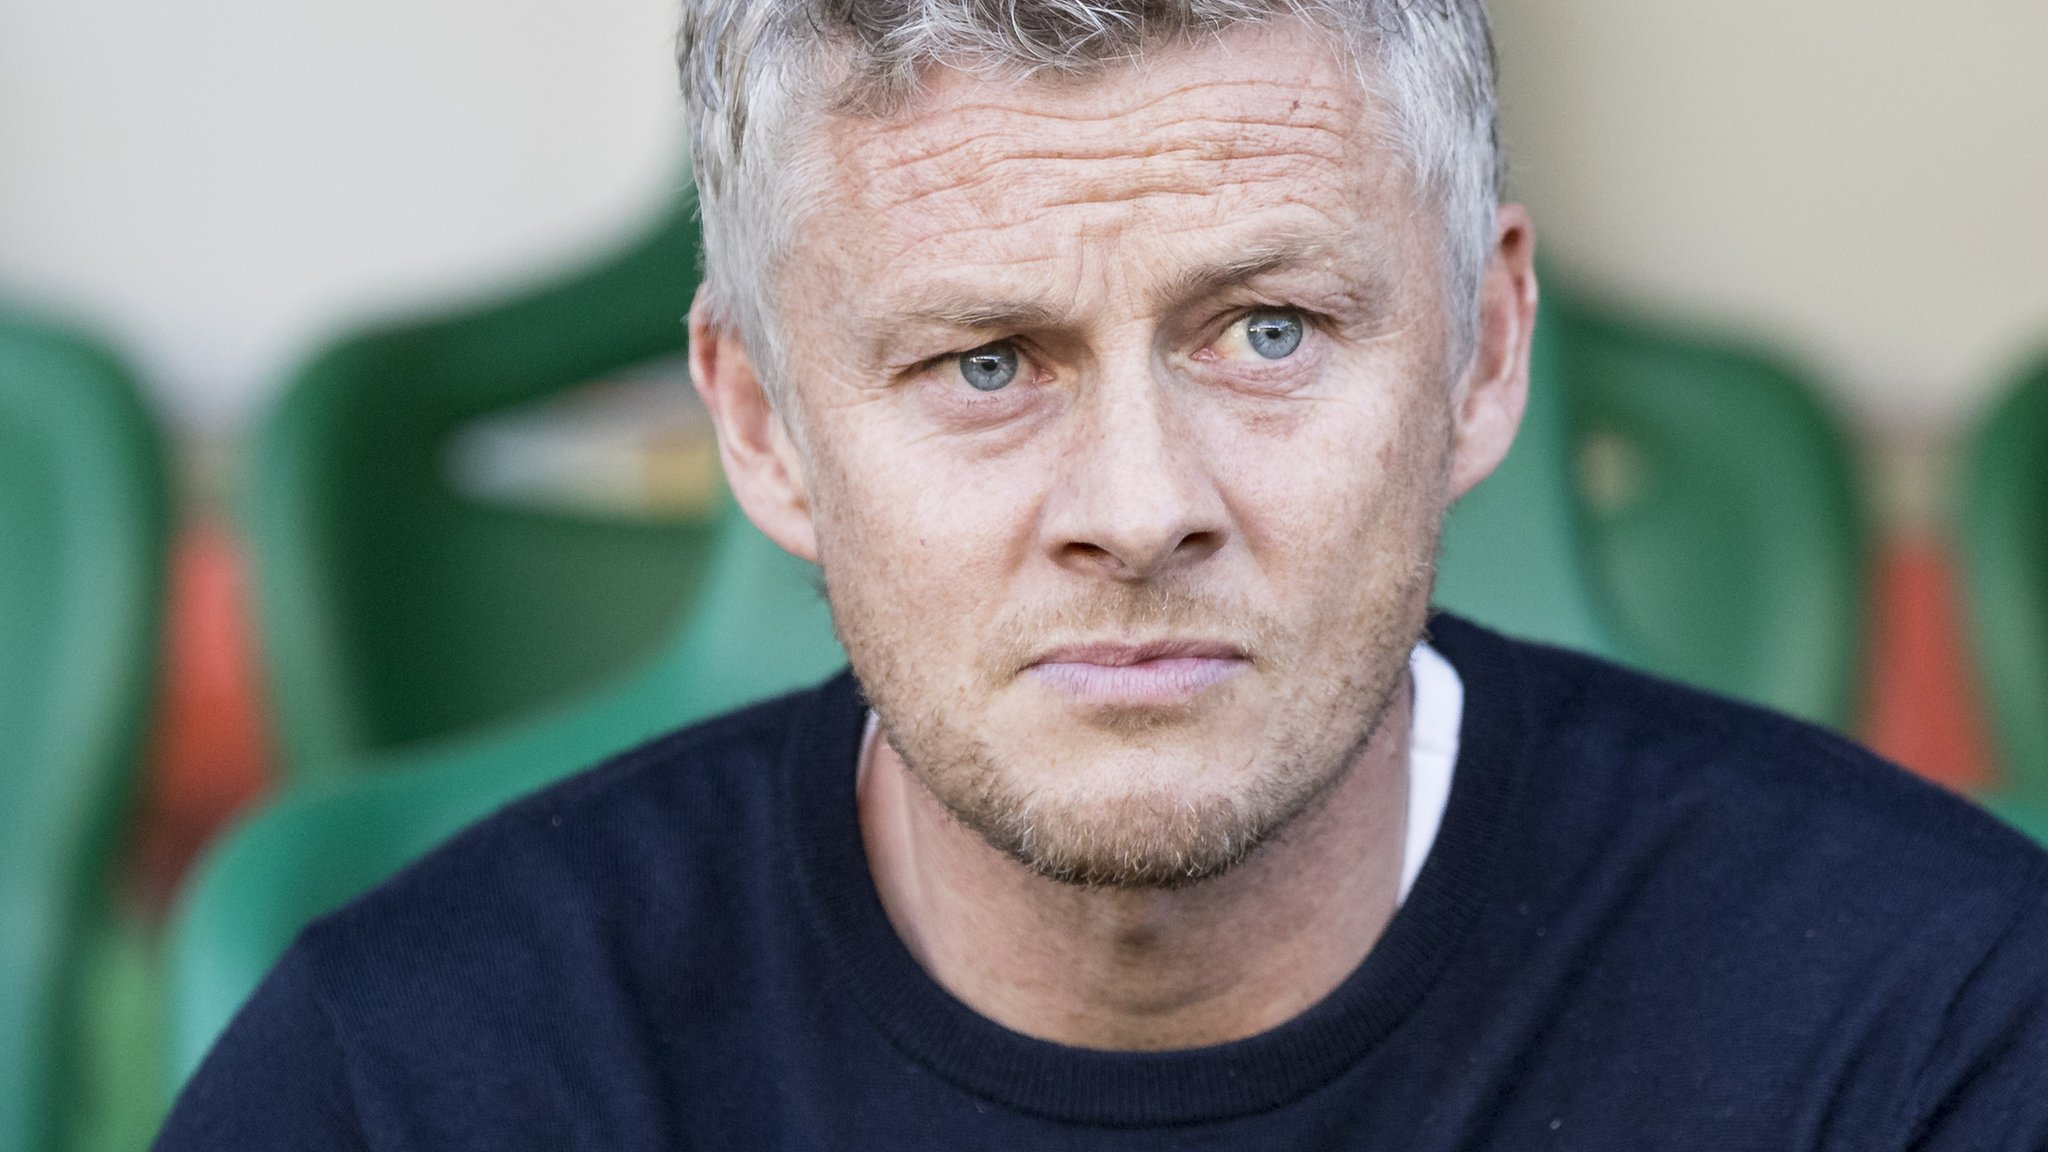 Man Utd: Ole Gunnar Solskjaer in contention as caretaker, Mauricio Pochettino tight-lipped